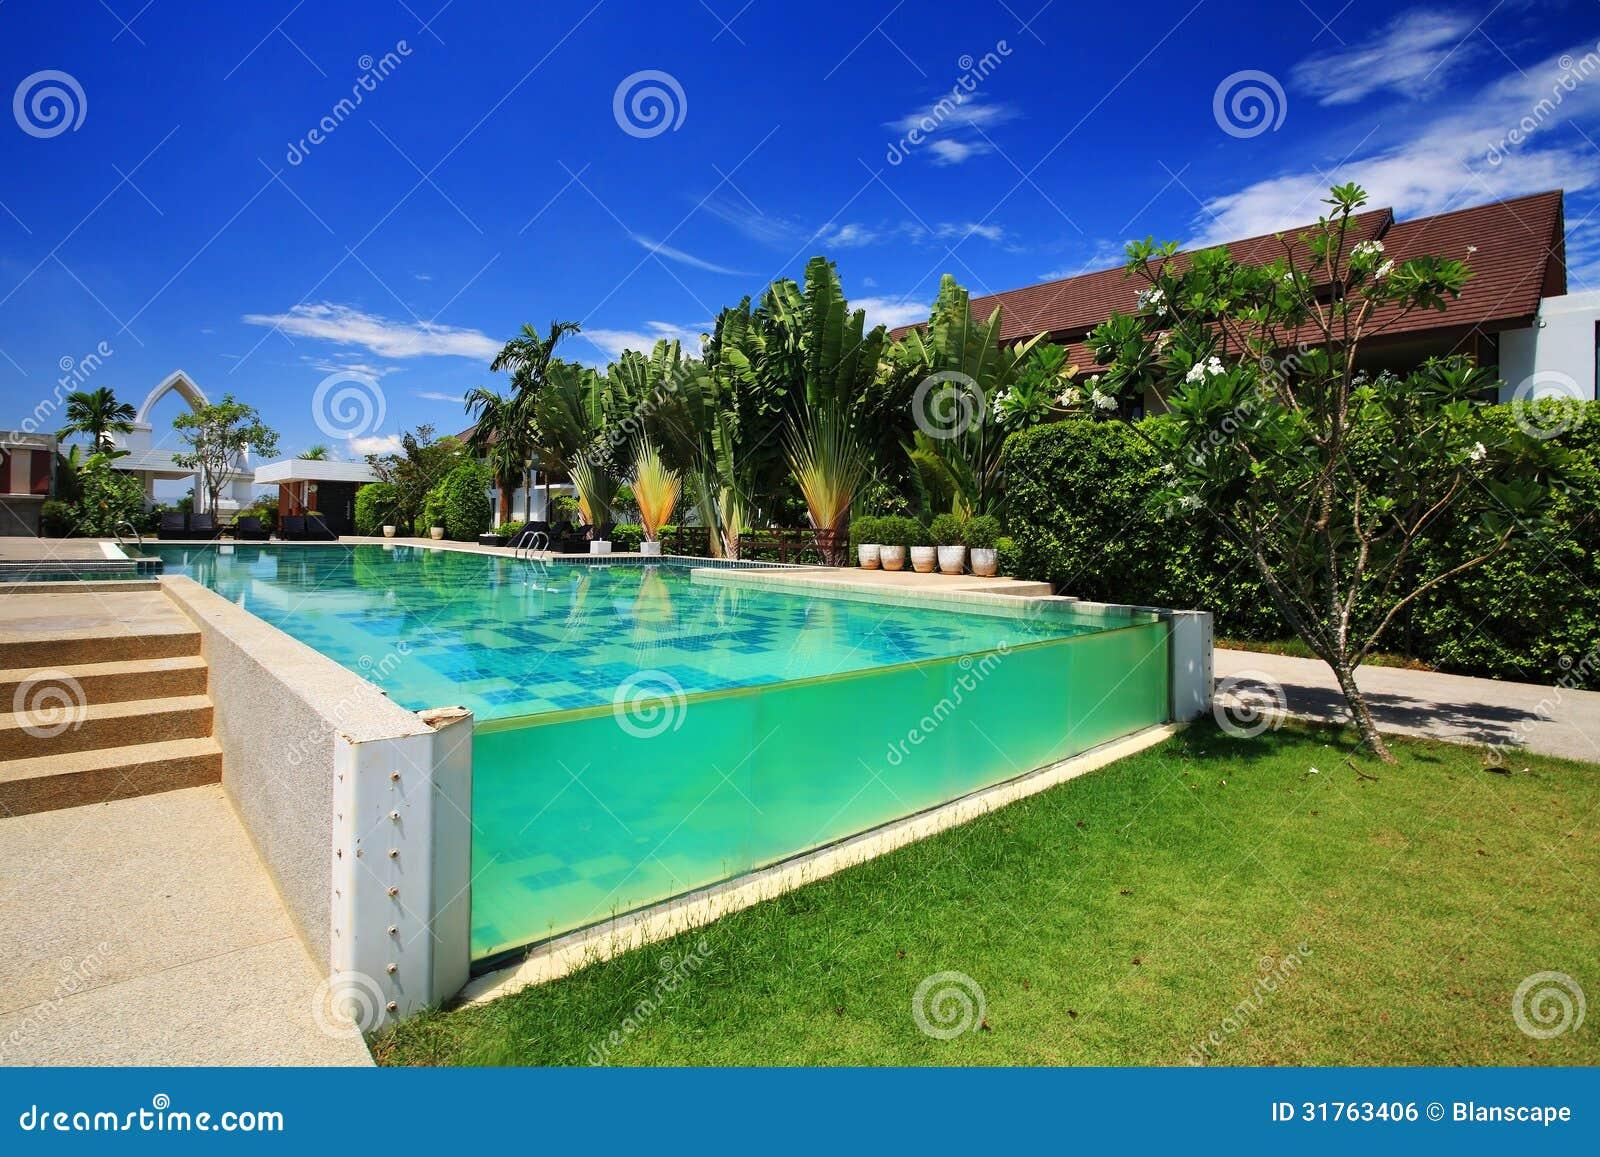 Luxury Resort Swimming Pool Royalty Free Stock Image Image 31763406